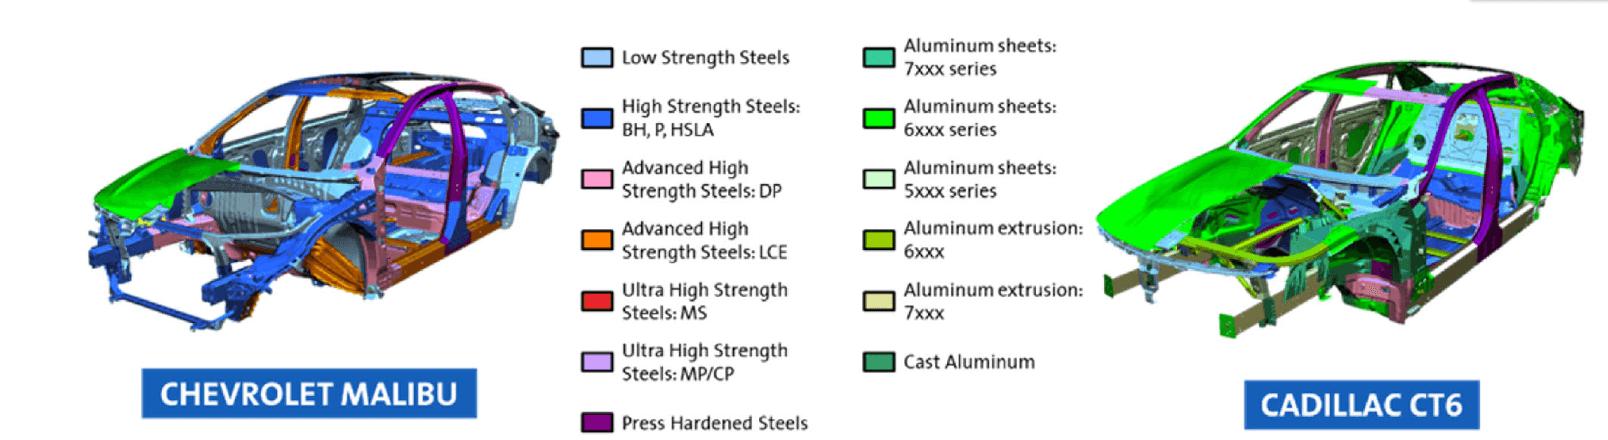 Mixed materials automotive body Caddilac CT6 and Chevrolet Malibu